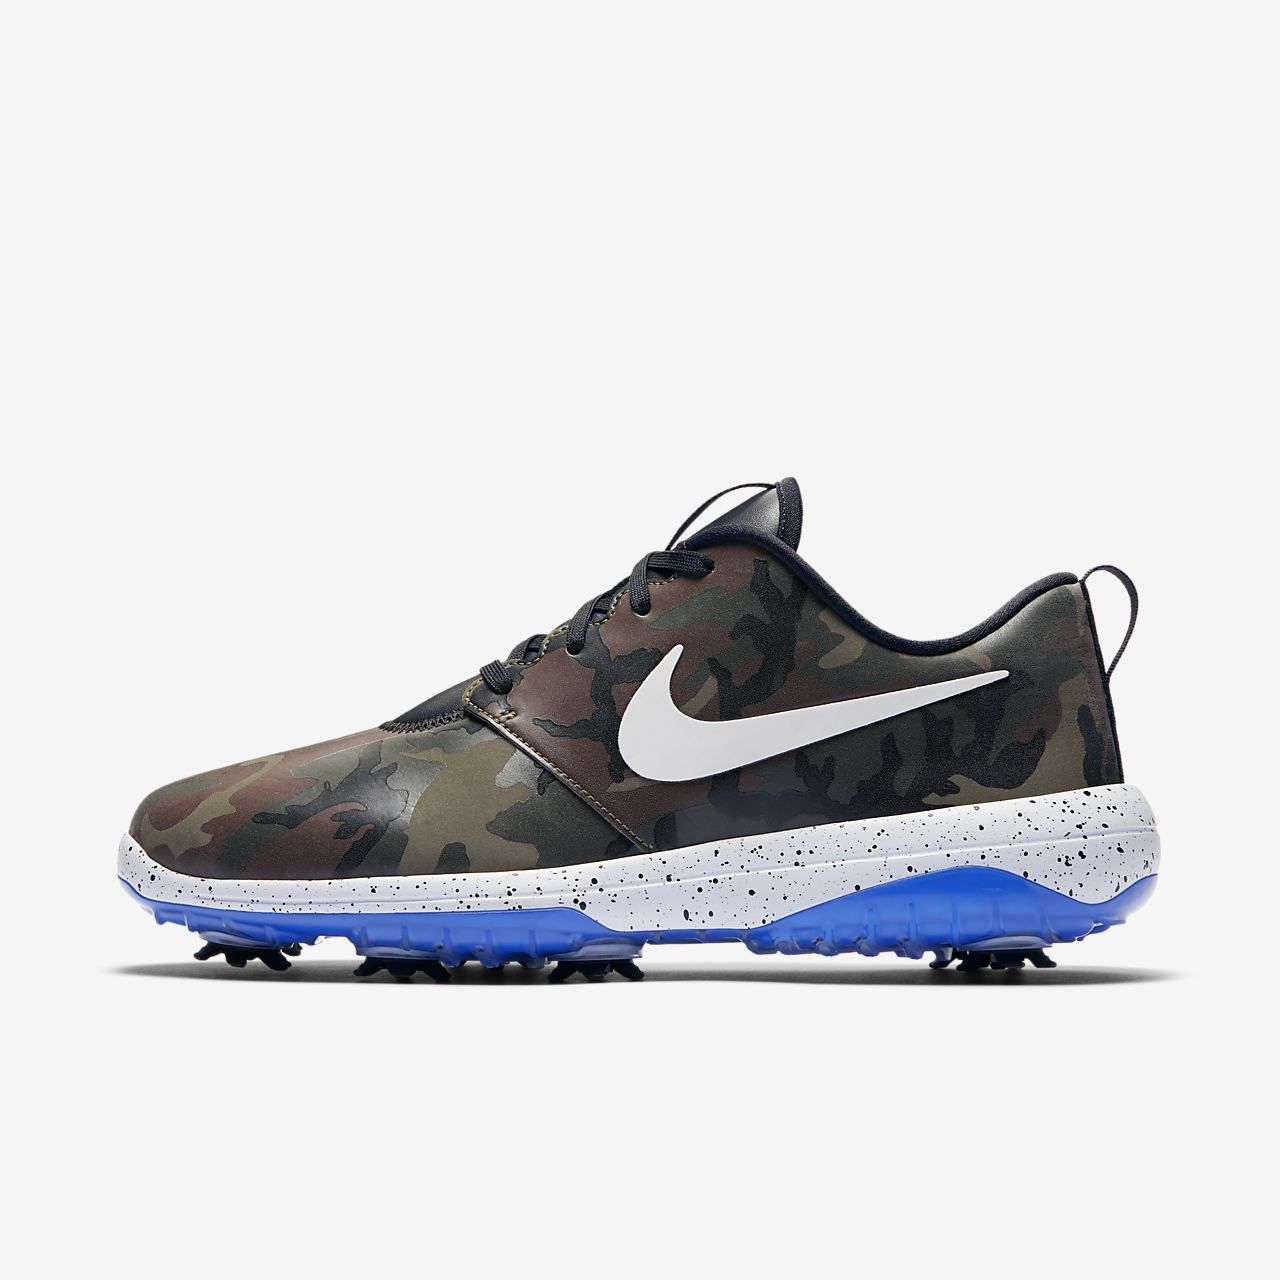 Chaussure de golf Nike Roshe G Tour NRG pour Homme